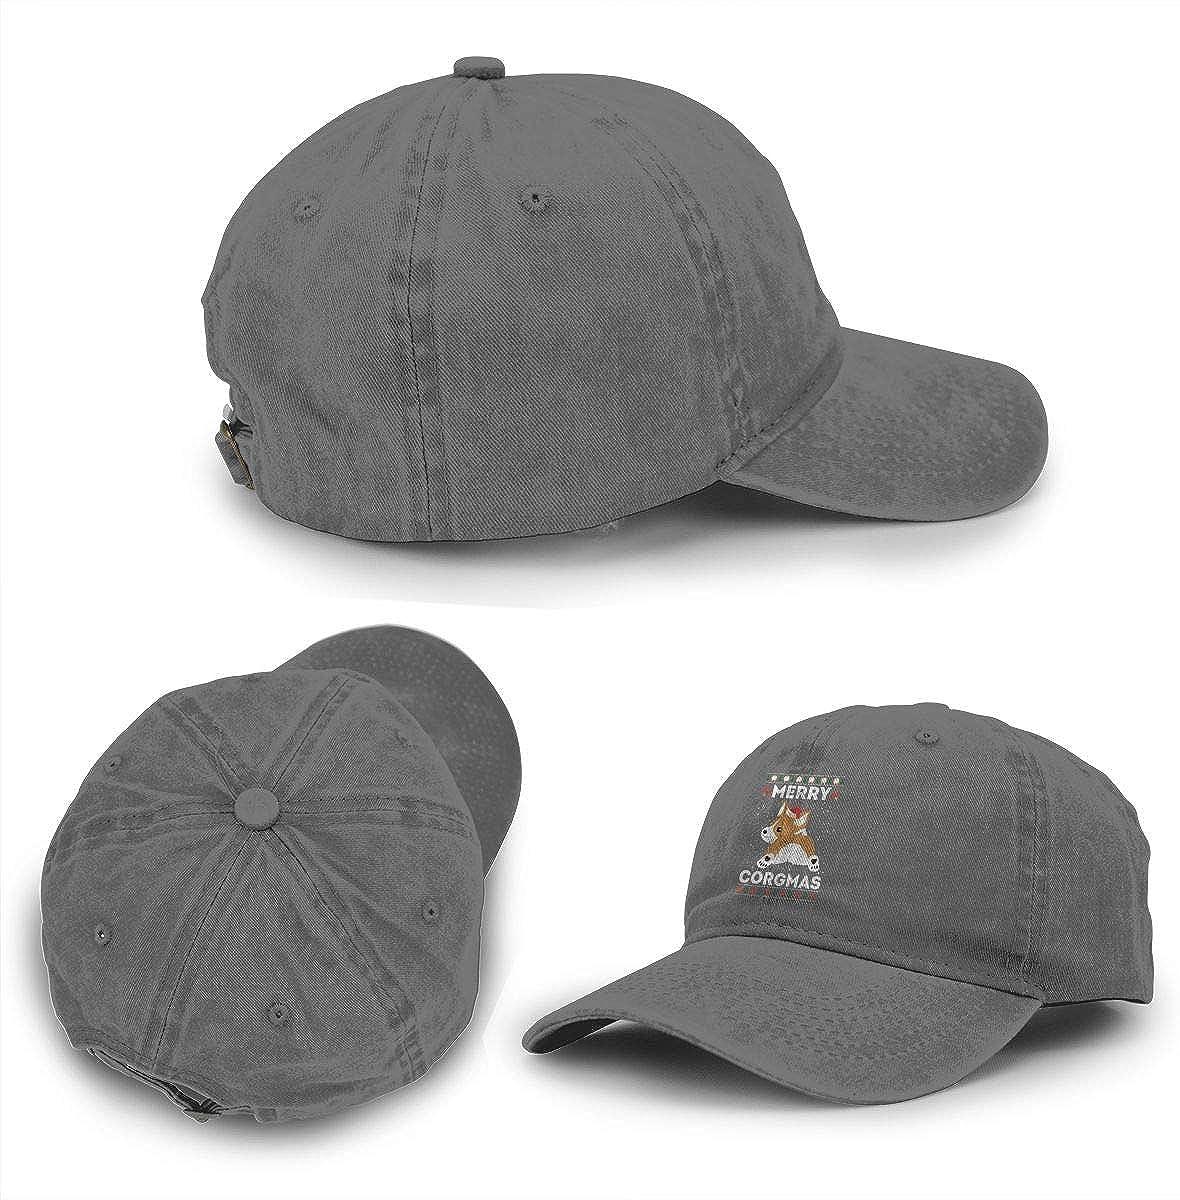 Cowboy Baseball Caps Denim Hats for Men Women Merry Corgmas Corgi Dog